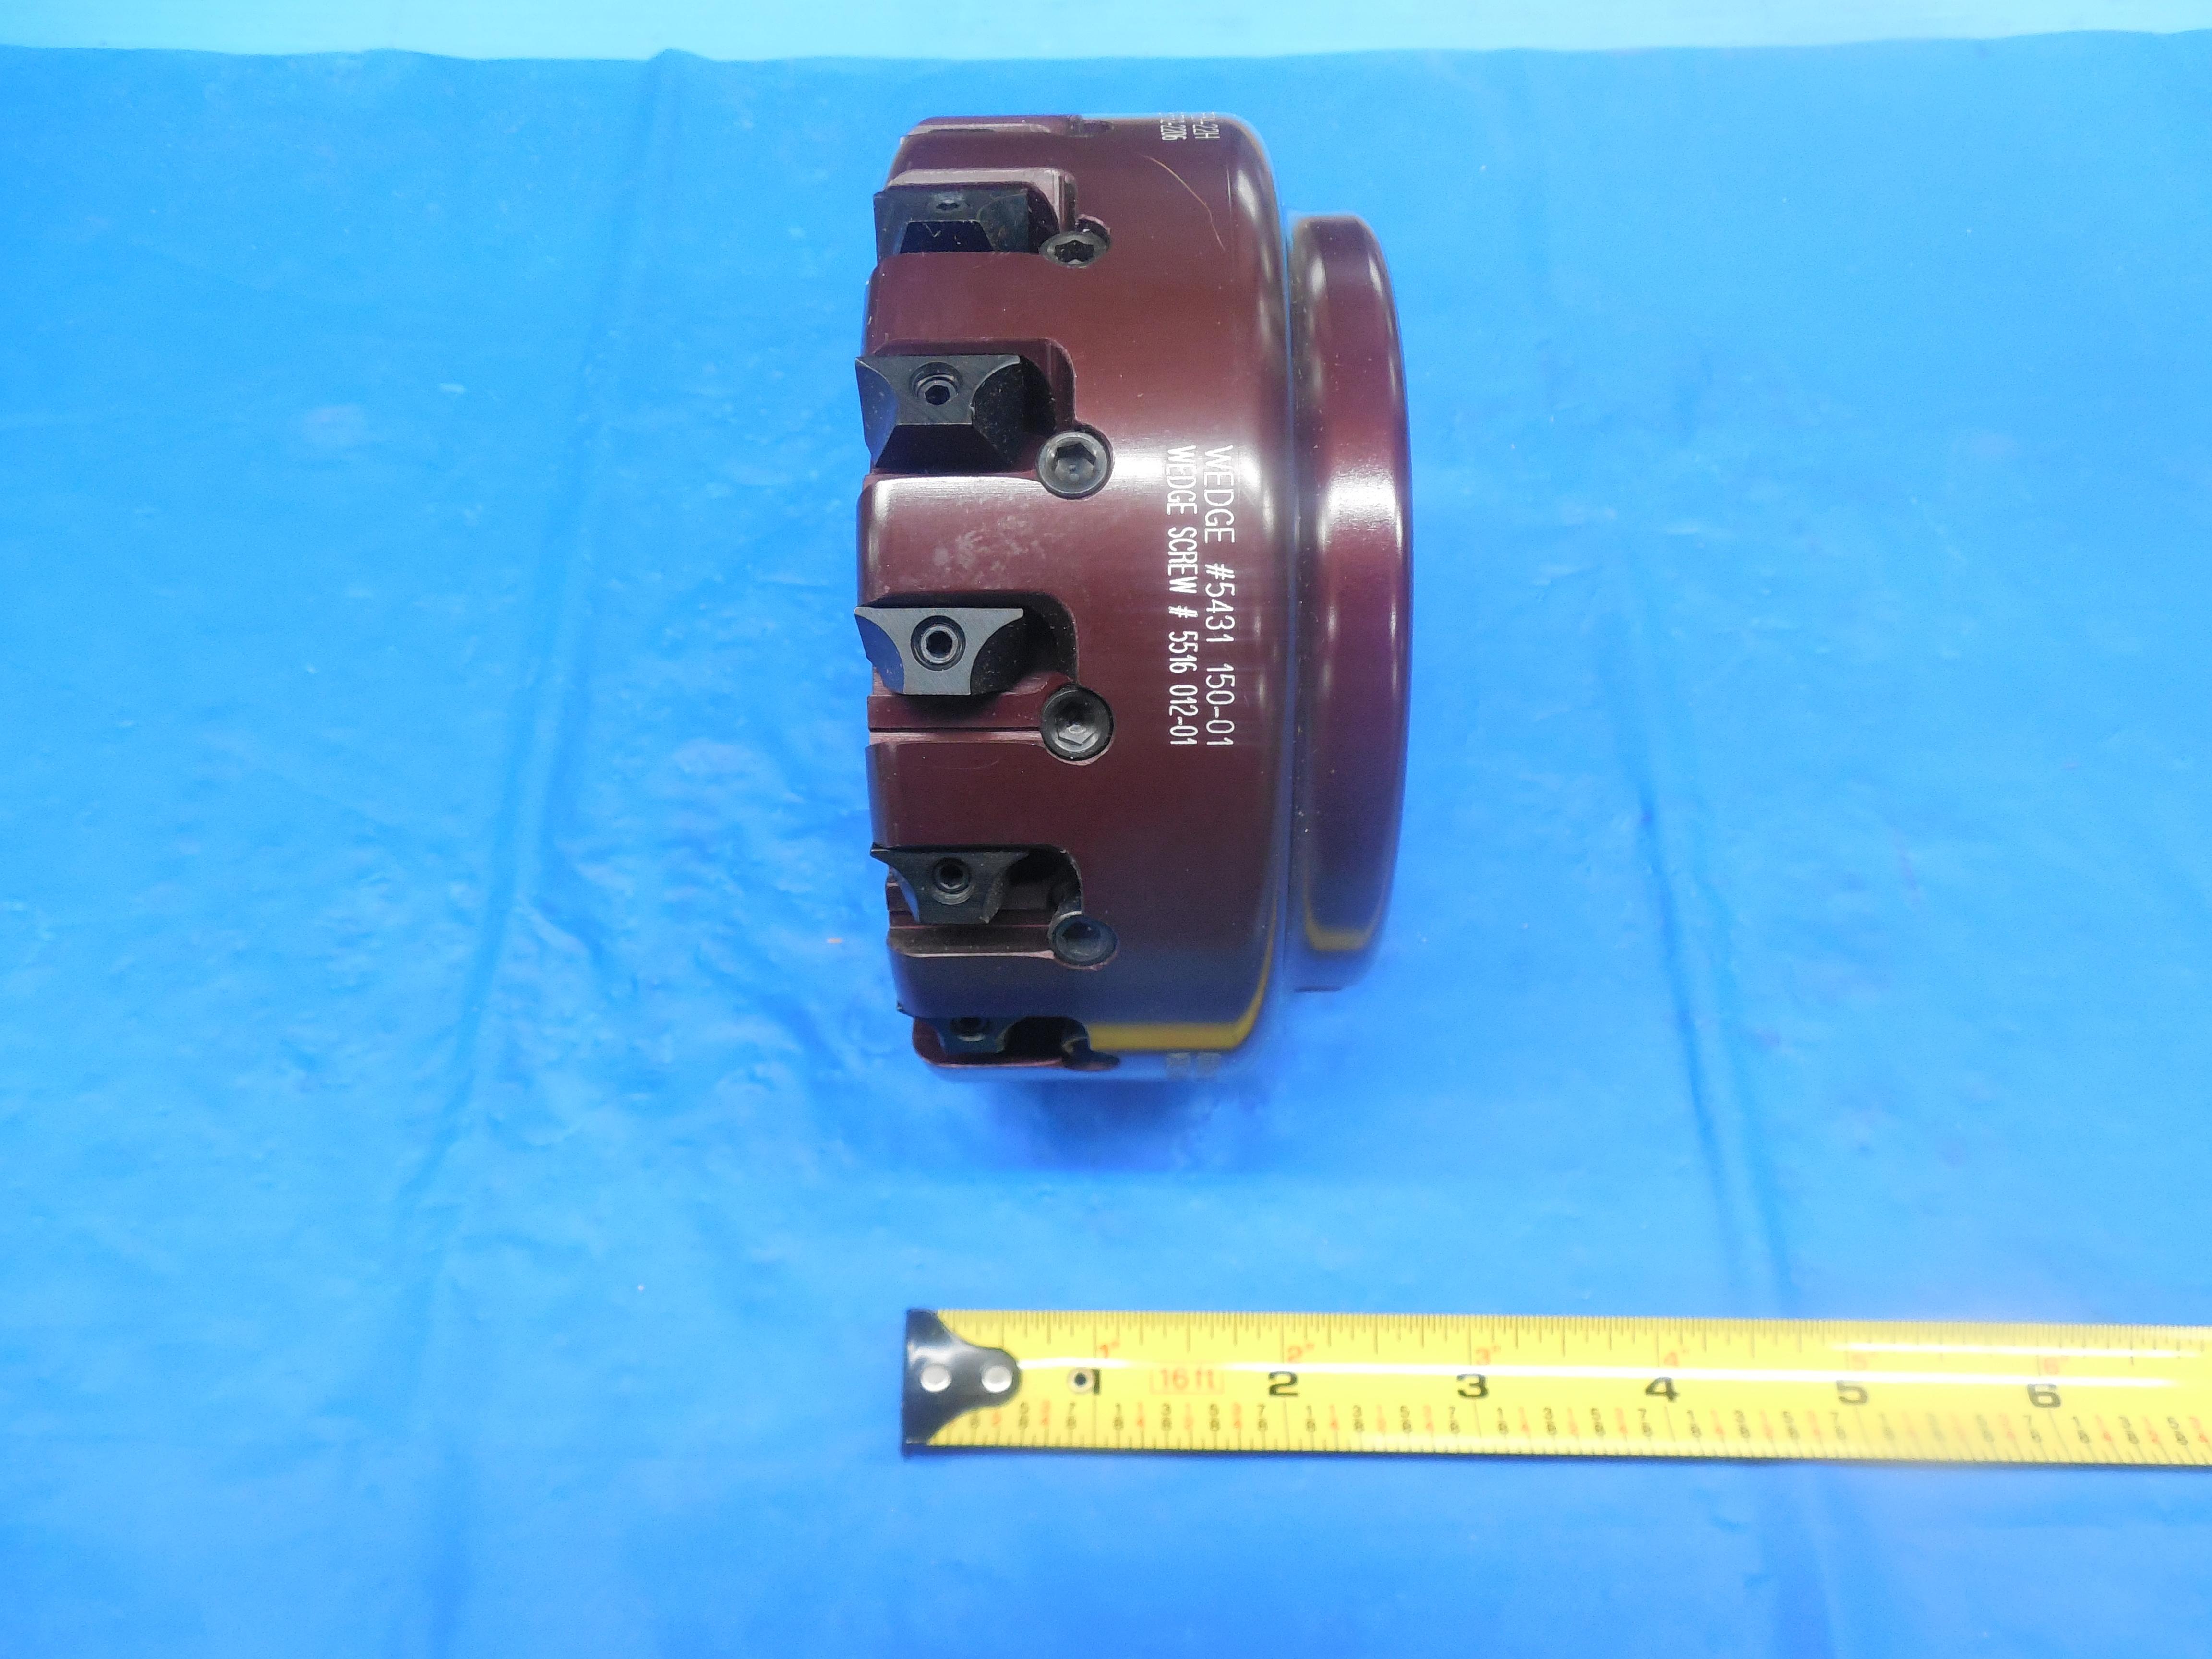 Jobber Drill Bit 51 Sz Cob Straw-Pack of 20 Cleveland C70184